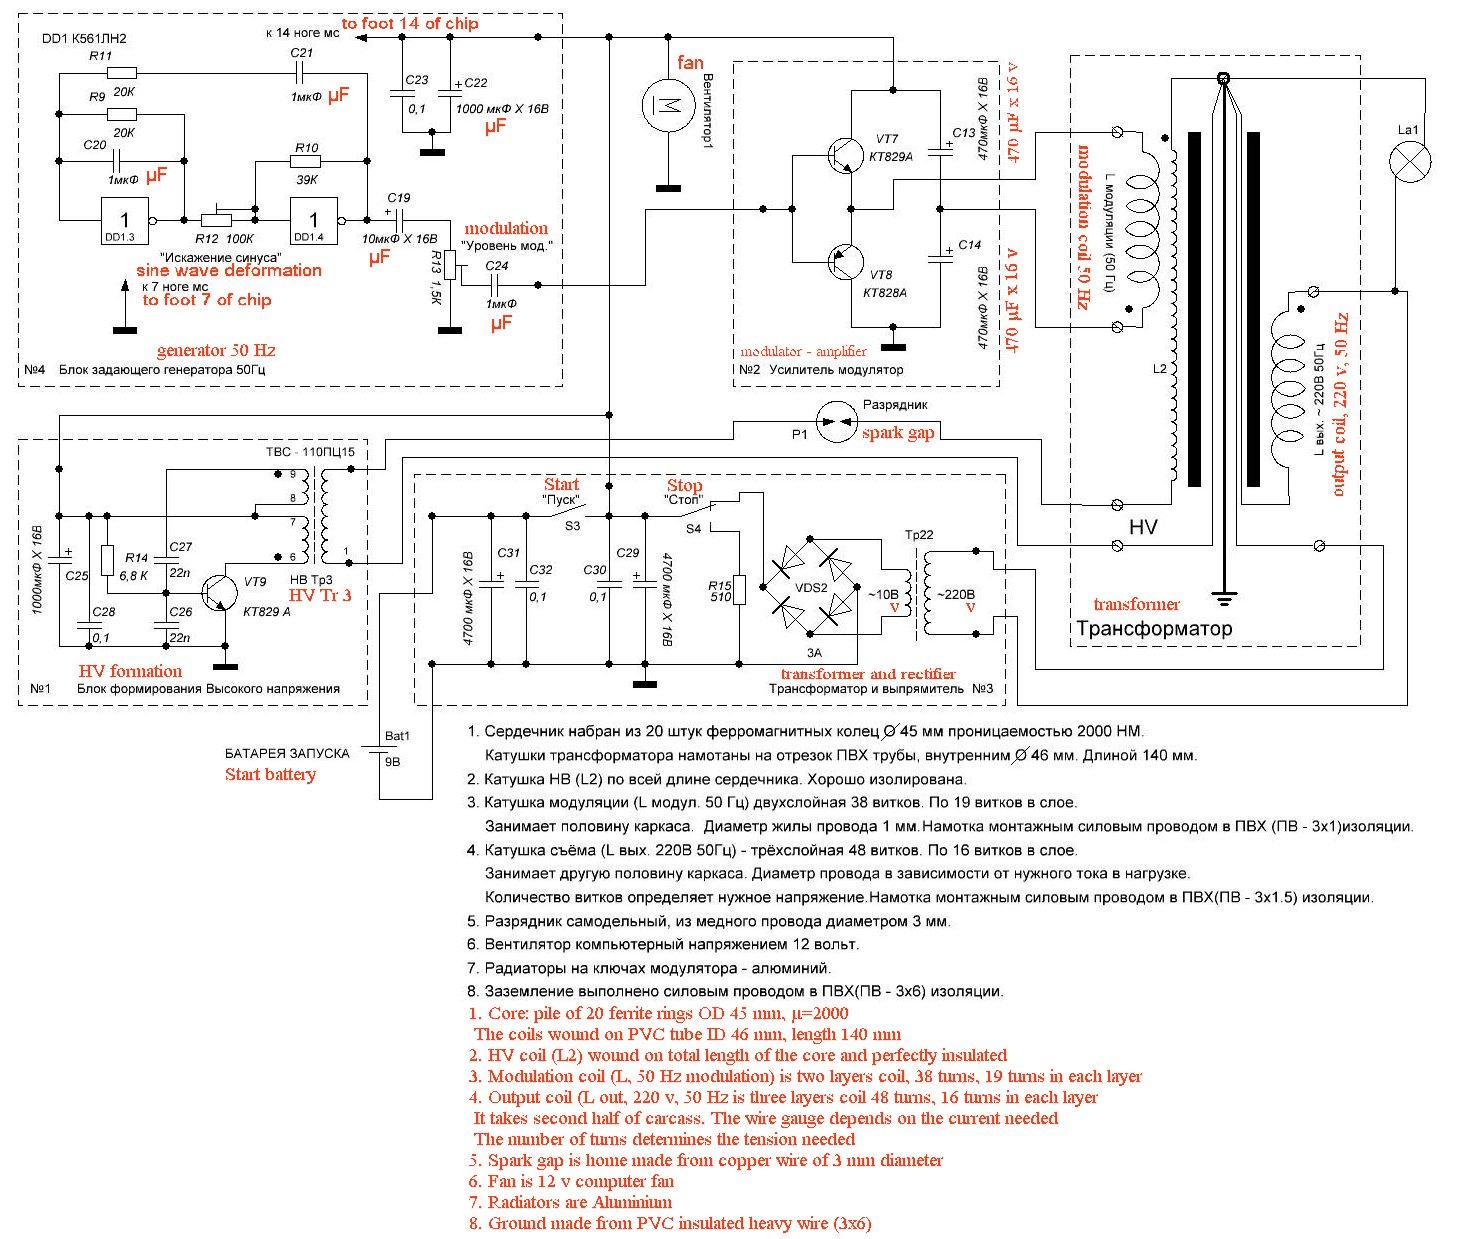 Neon Sign Transformer Wiring Diagram Free Energy Kapanadze Free Energy Generator Schematics